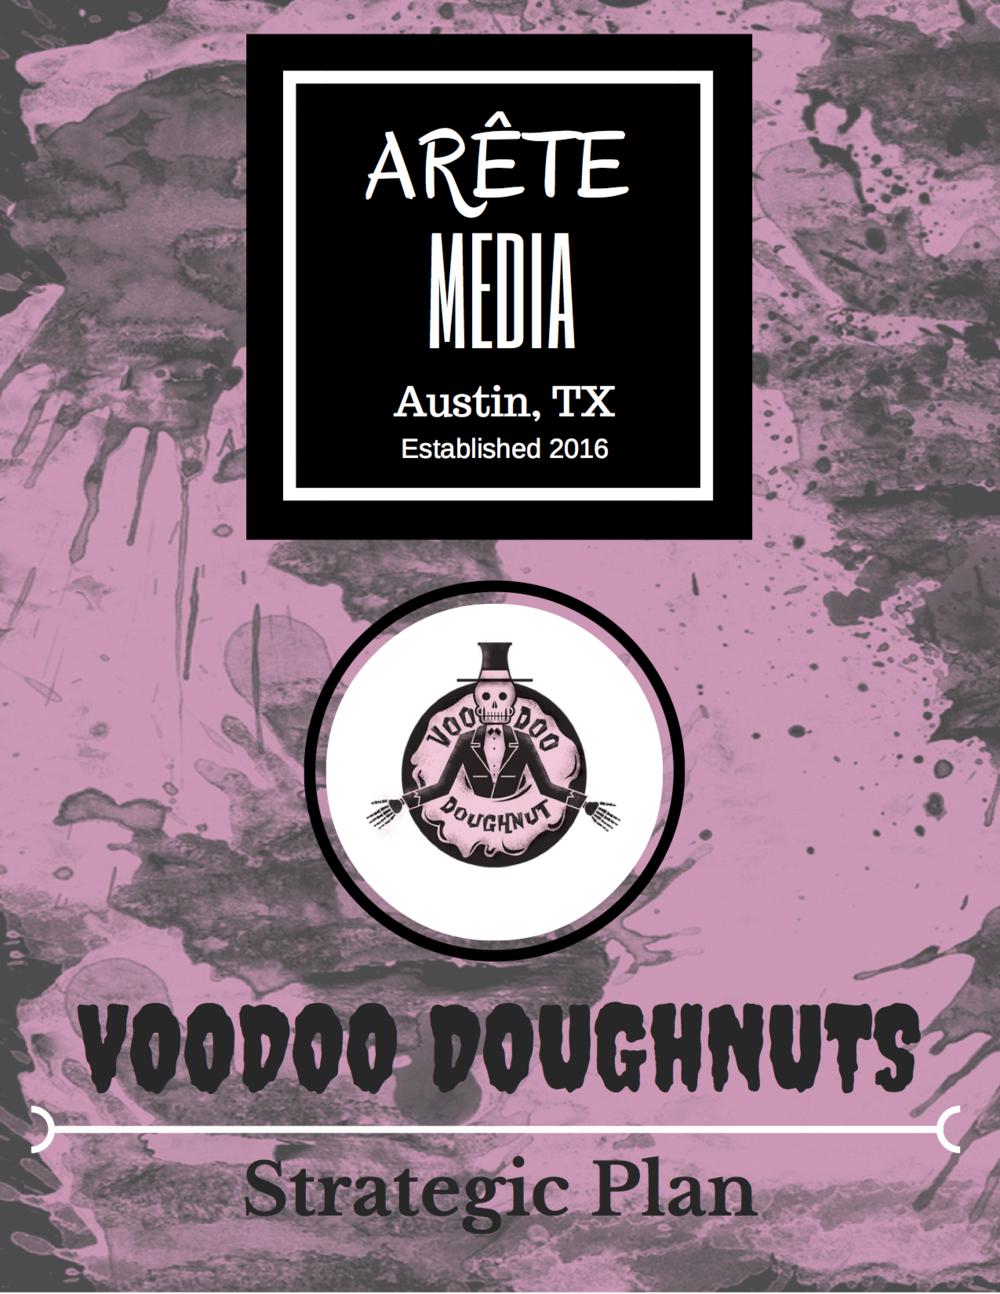 Voodoo Doughnut (dragged).png